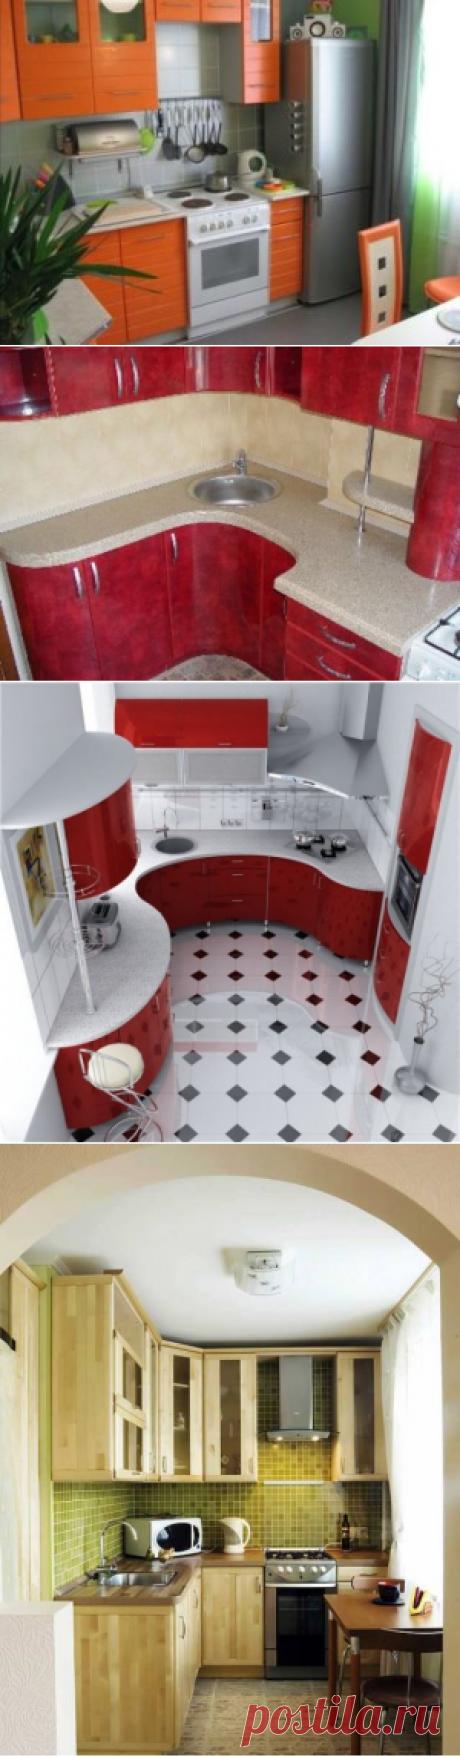 Интерьеры маленьких кухонь.